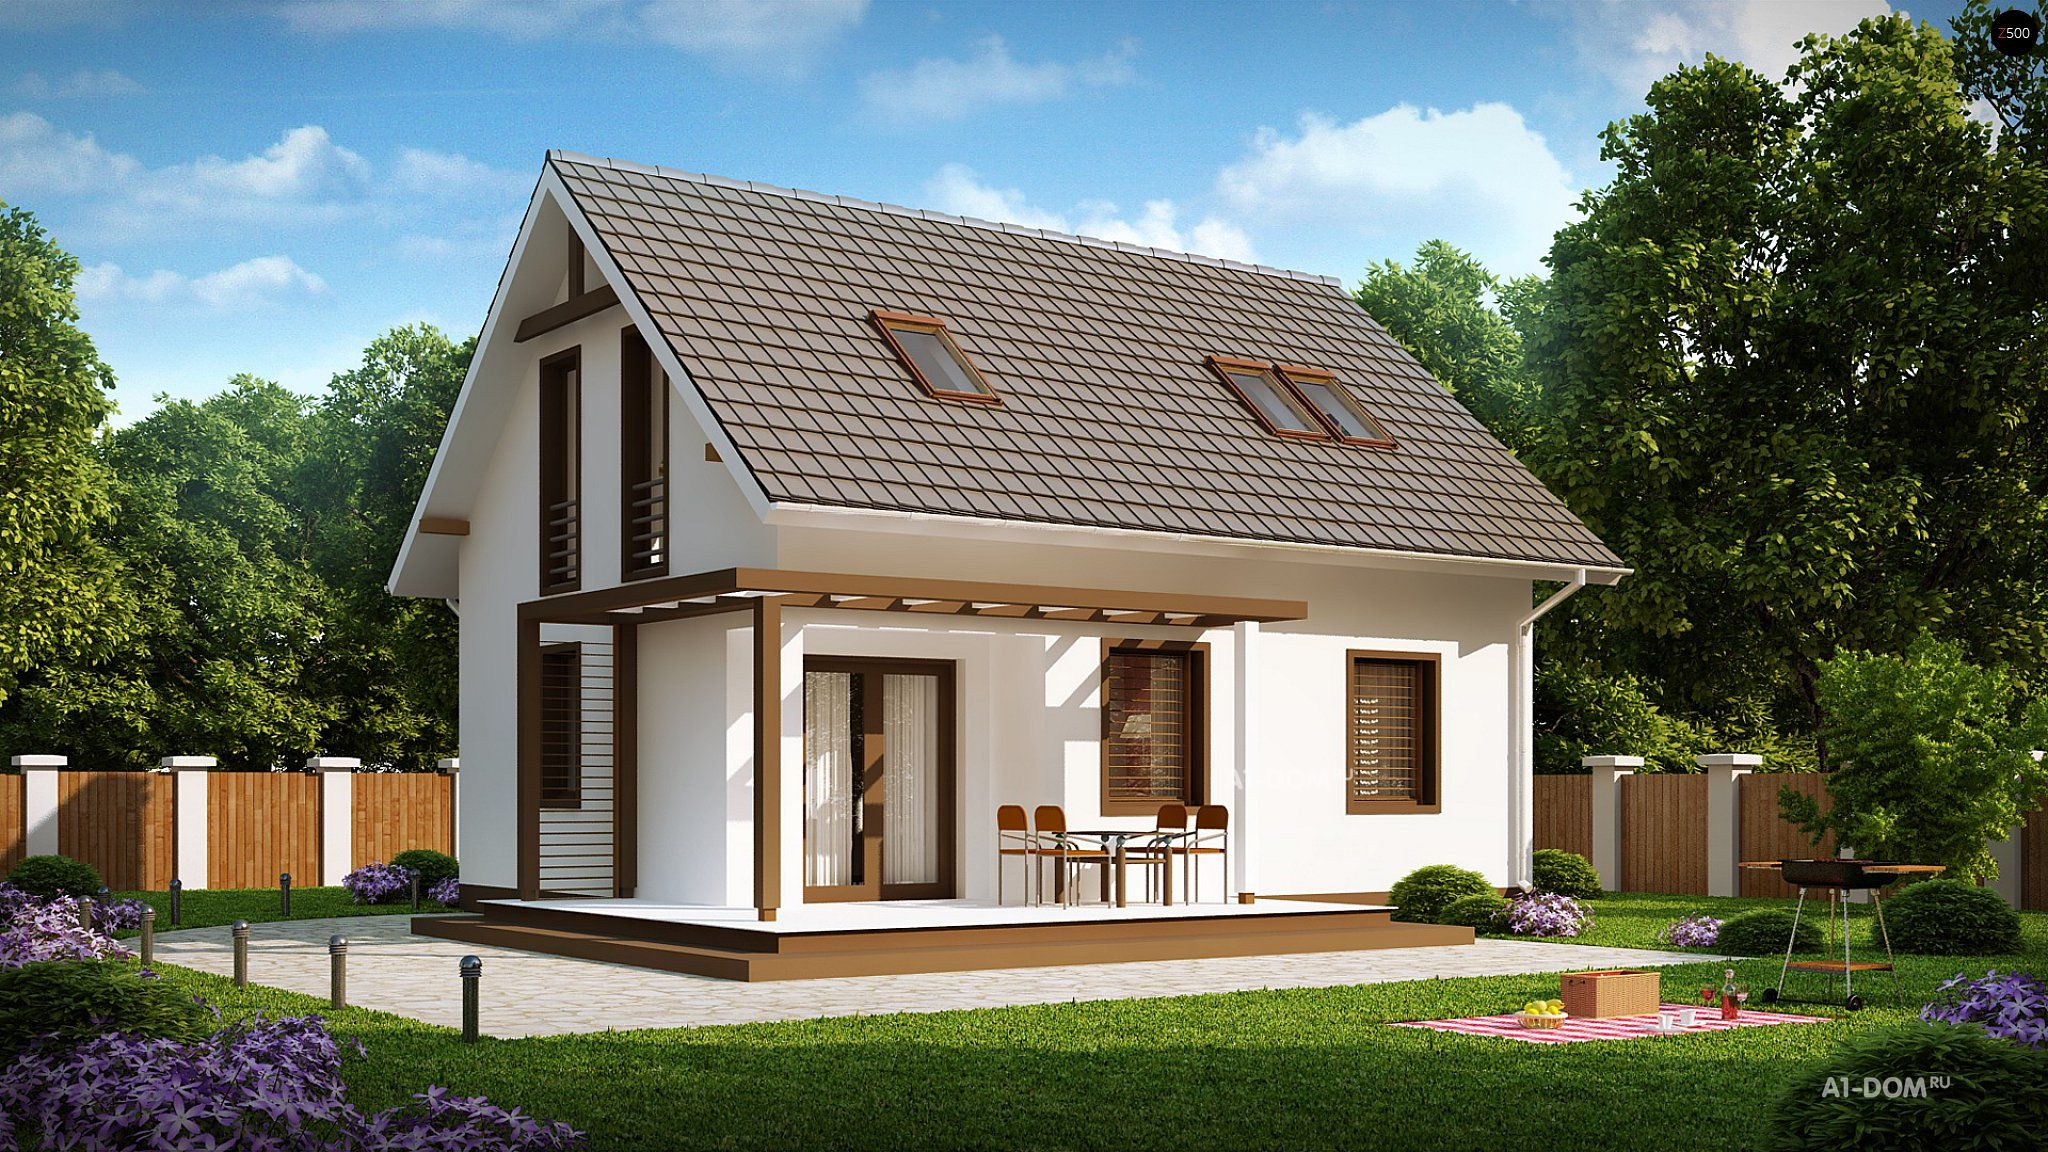 этажные дома - stroi-svoidomru